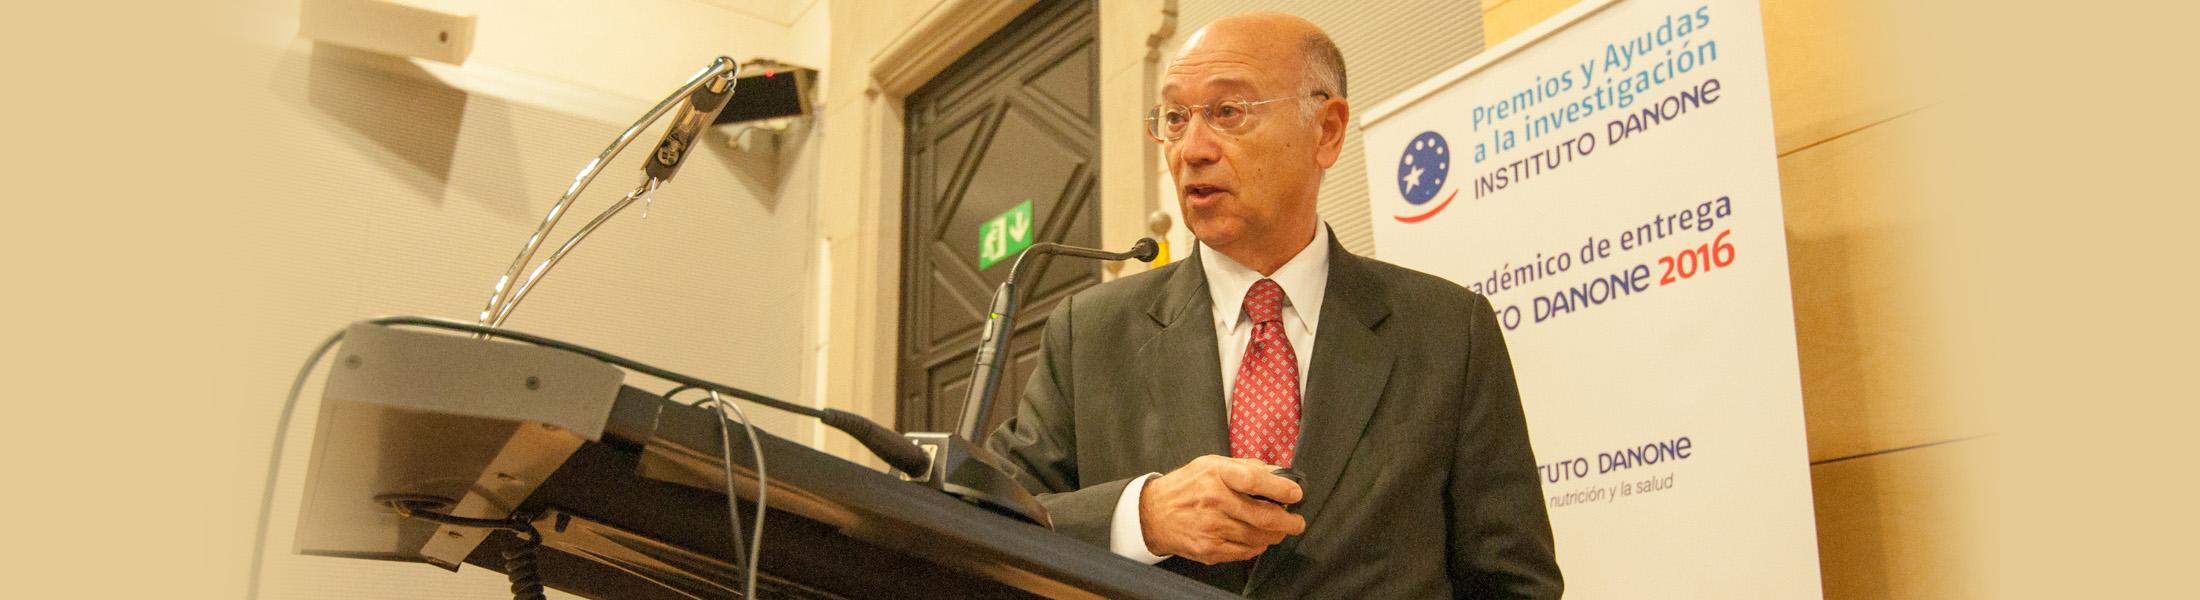 "Premio a la trayectoria científica ""Dr. Carles Henneberg"""